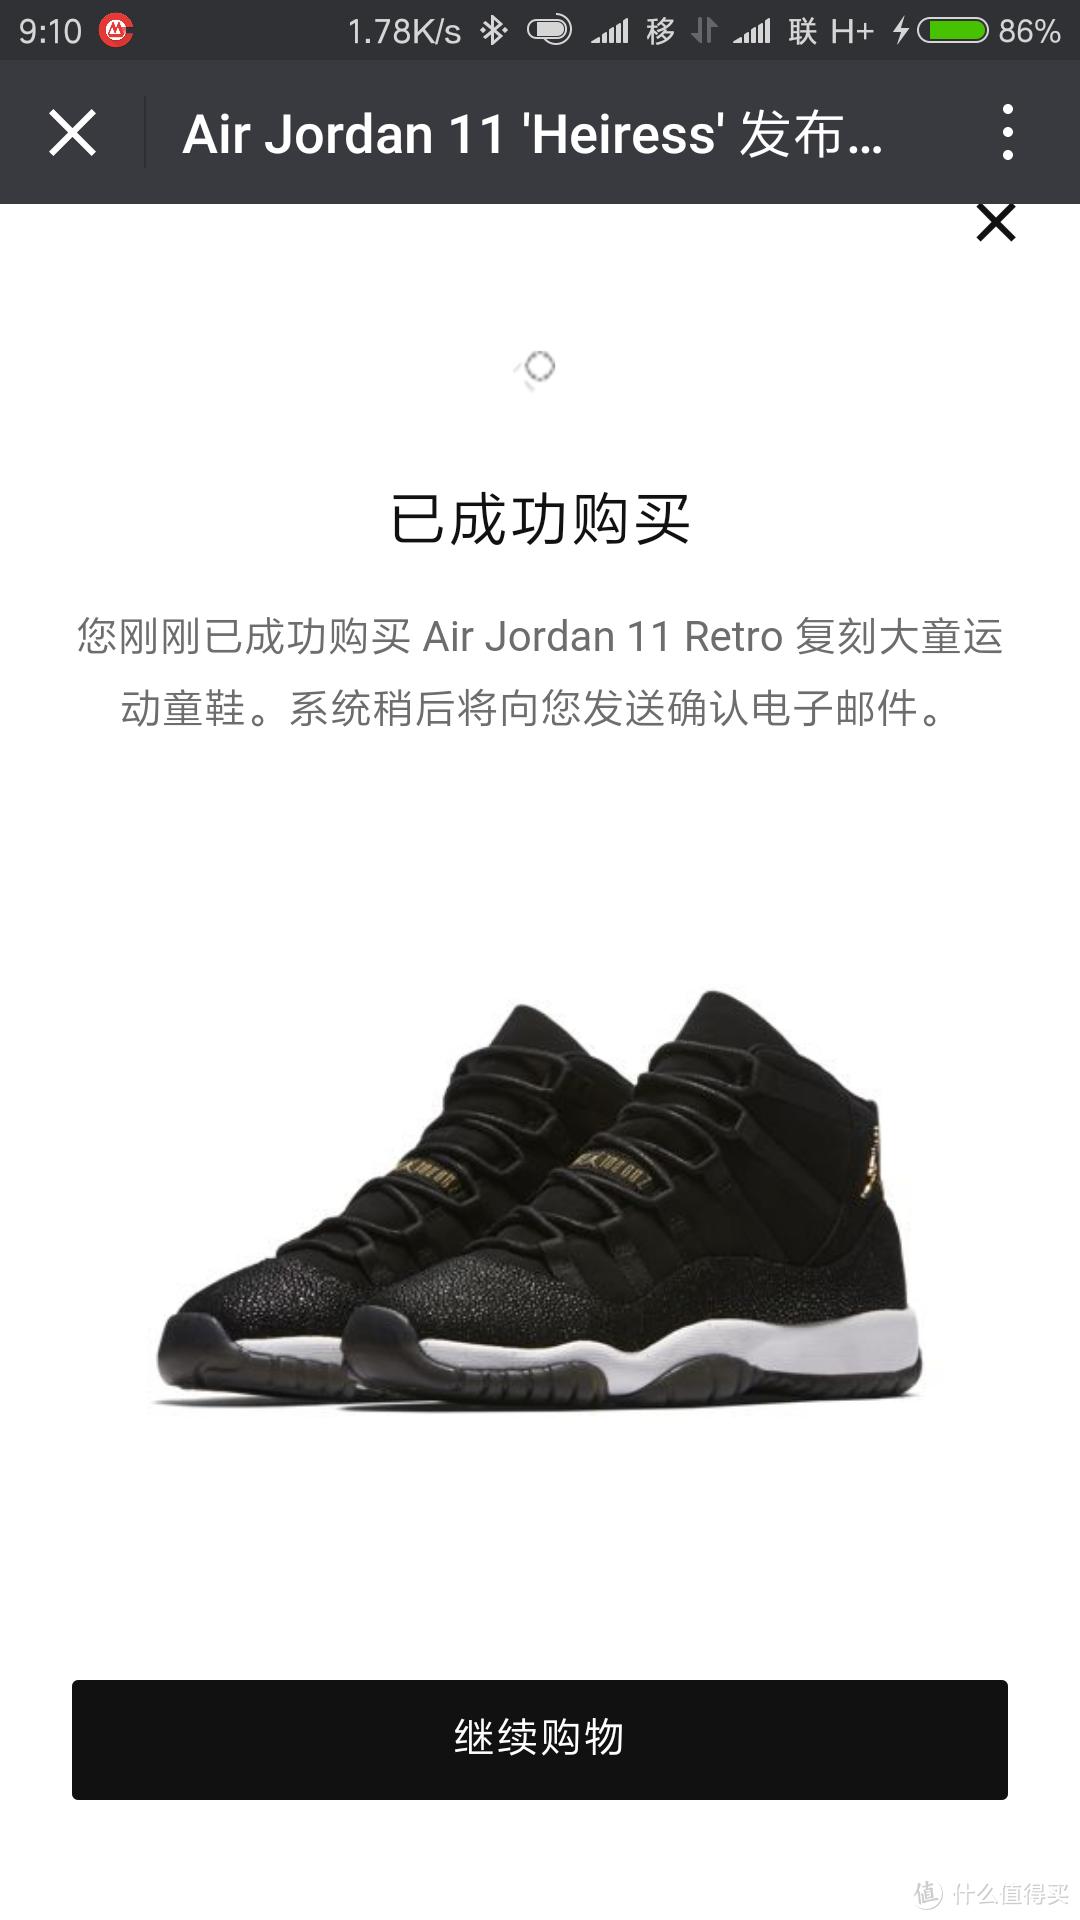 Air Jordan XI Heiress 一双Bling Bling的AJ 11系列 运动鞋 开箱